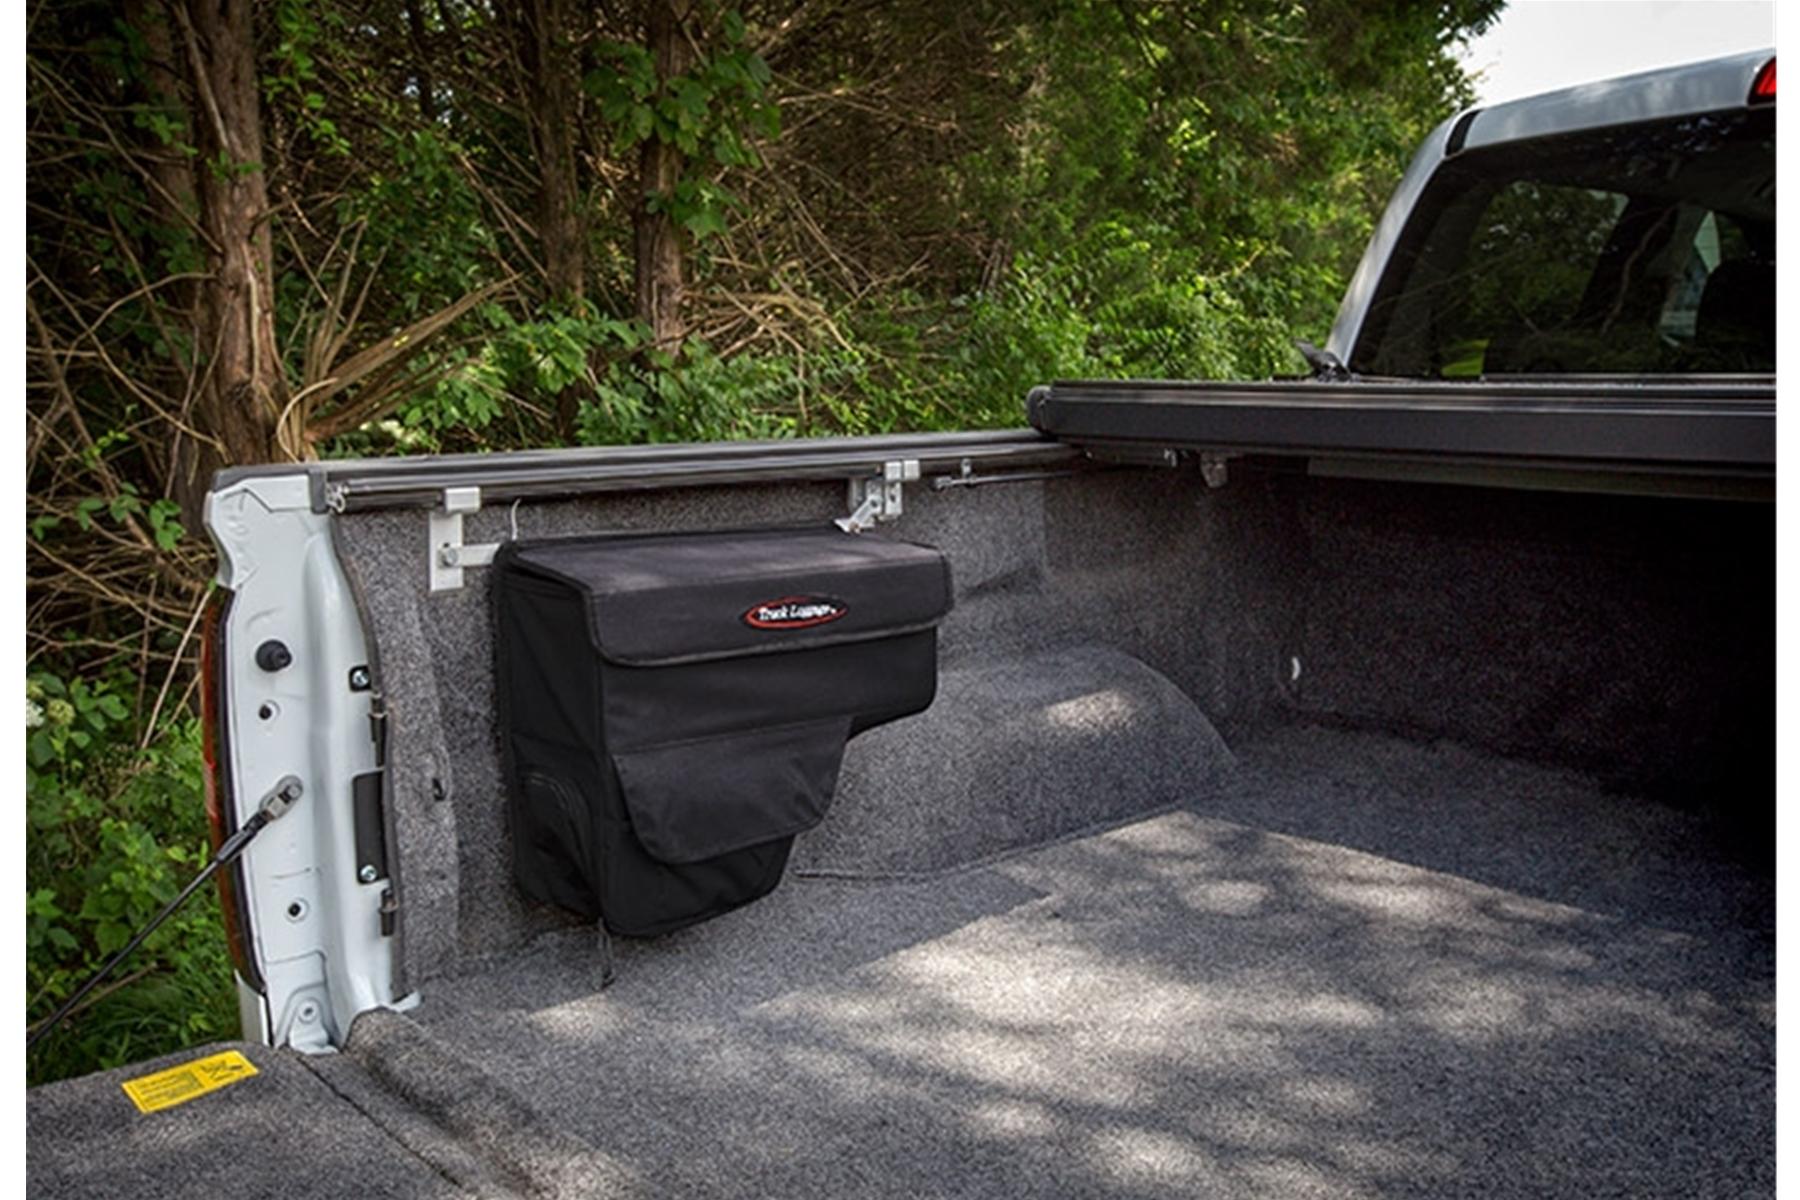 2007 Dodge Ram 2500 Undercover Ultra Flex Tonneau Covers